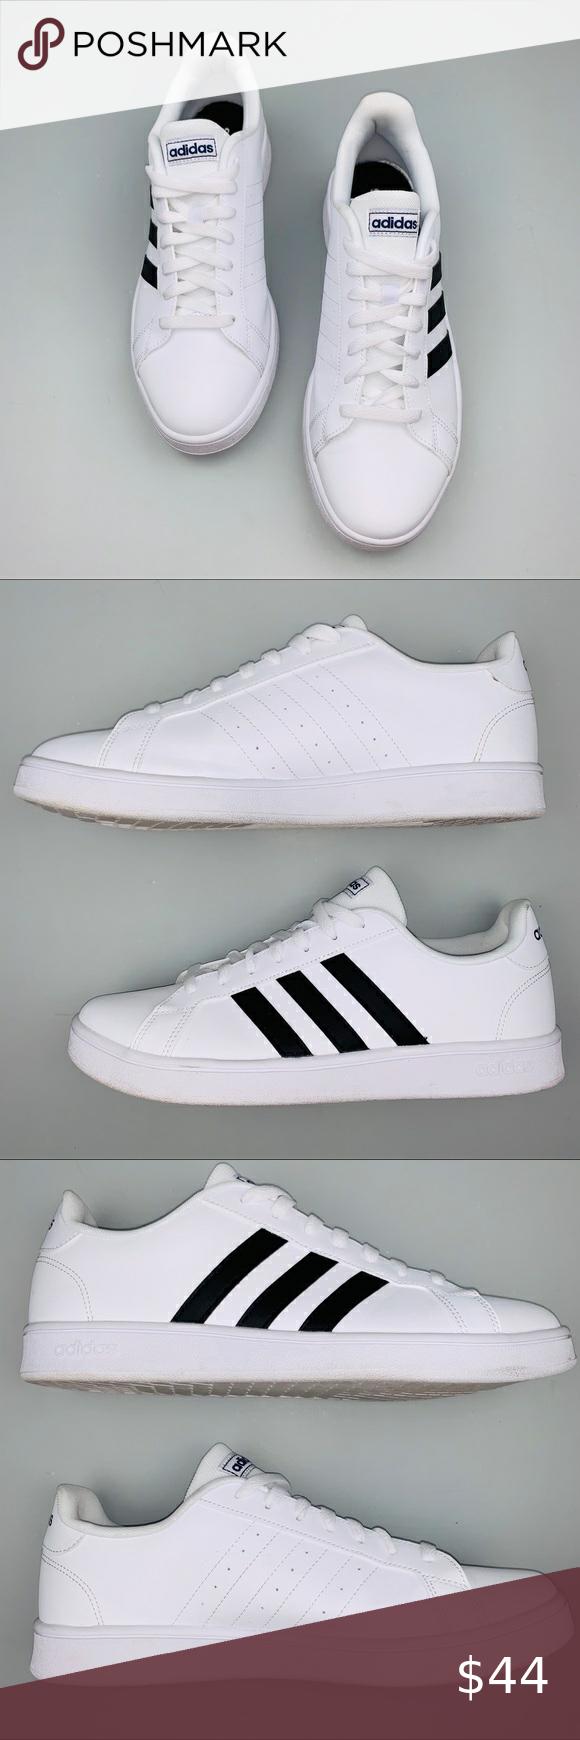 Adidas Men's Grand Court Sneakers White